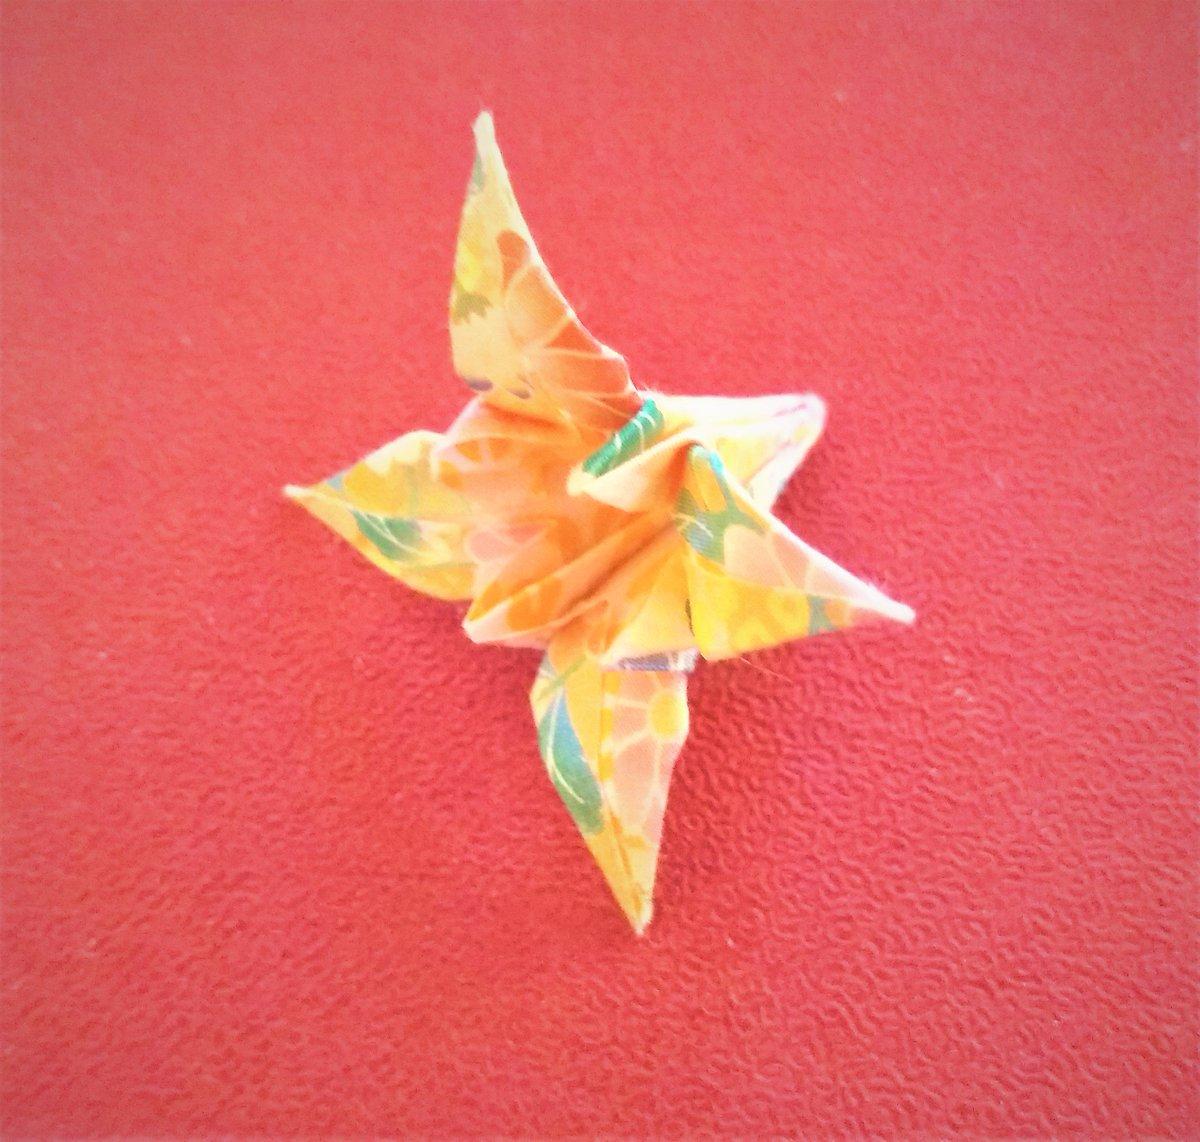 Noriko grace designs on twitter opening iris flower is very noriko grace designs on twitter opening iris flower is very satisfying from nothing like flower to becoming 3d flower origami iris opening 3d izmirmasajfo